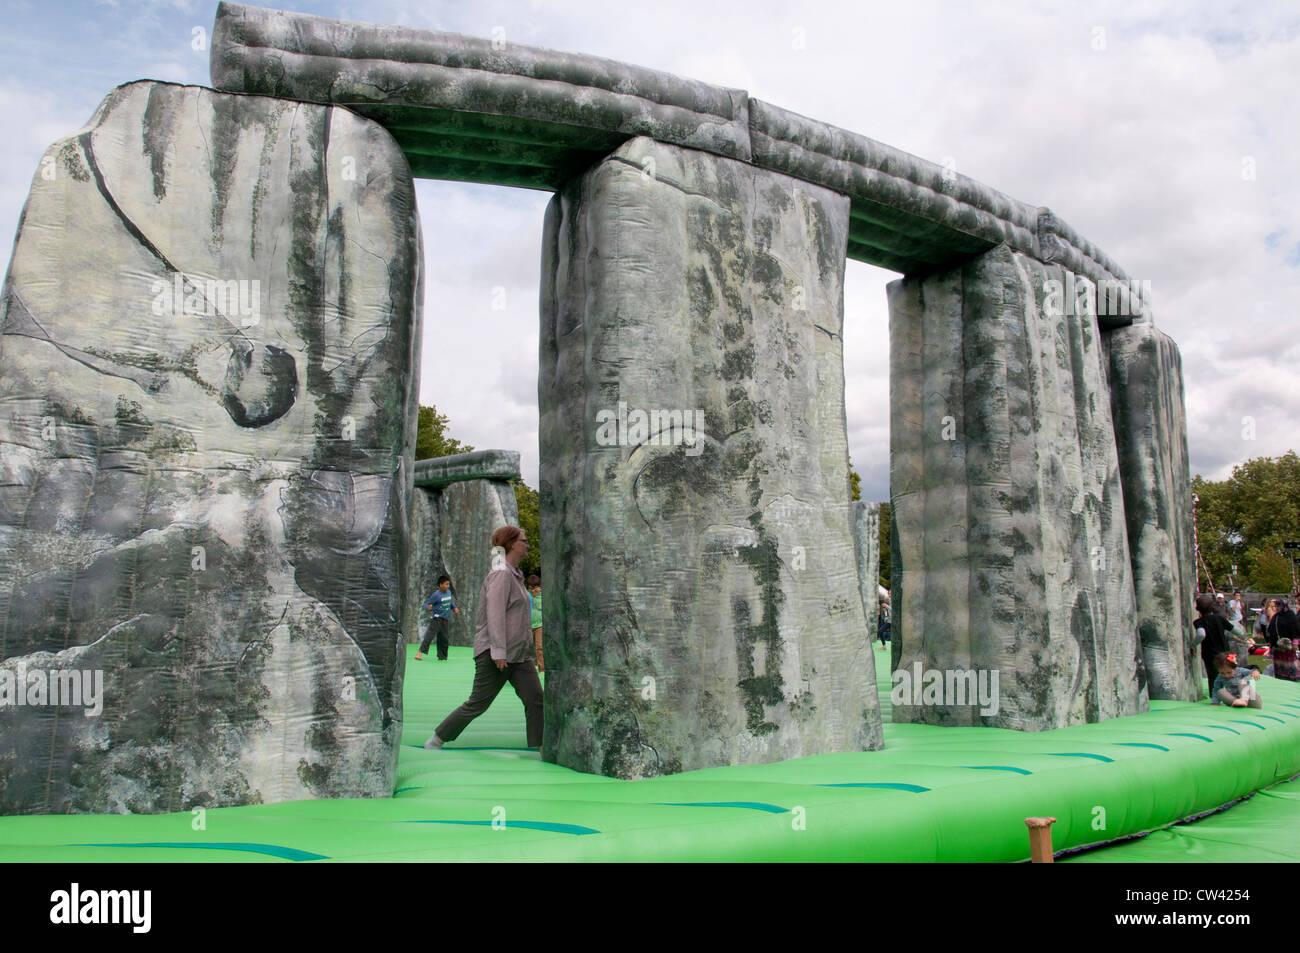 Sacriledge, Stonehenge Hüpfburg von Jeremy Deller, Teil der Kultur-Olympiade, London Borough of Newham Stockbild